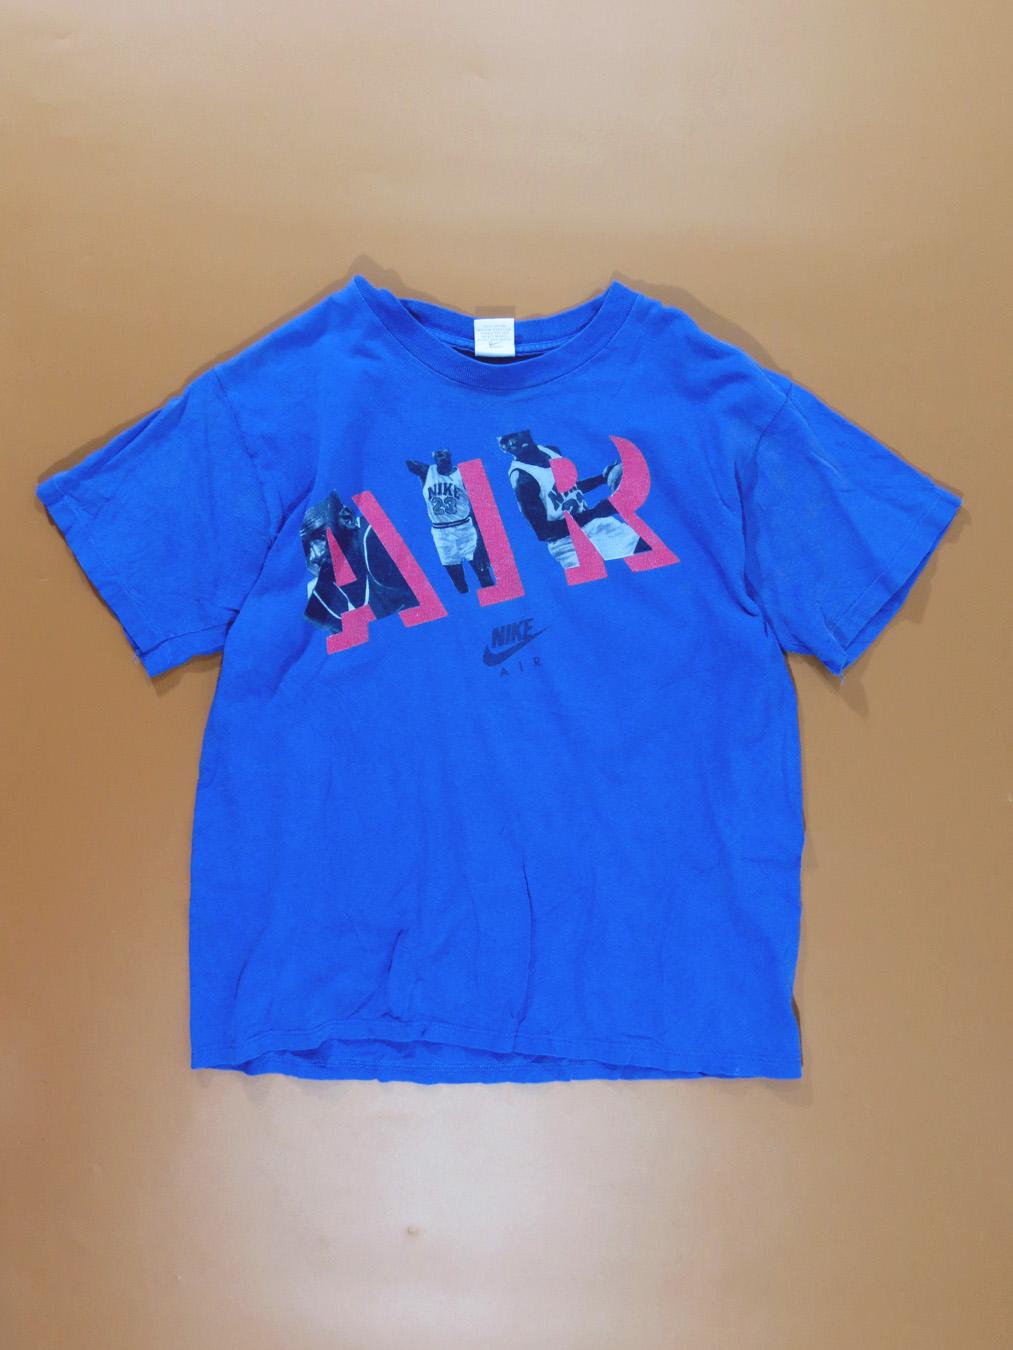 90s Nike Air Michael Jordan Blue T Shirt 5 Star Vintage